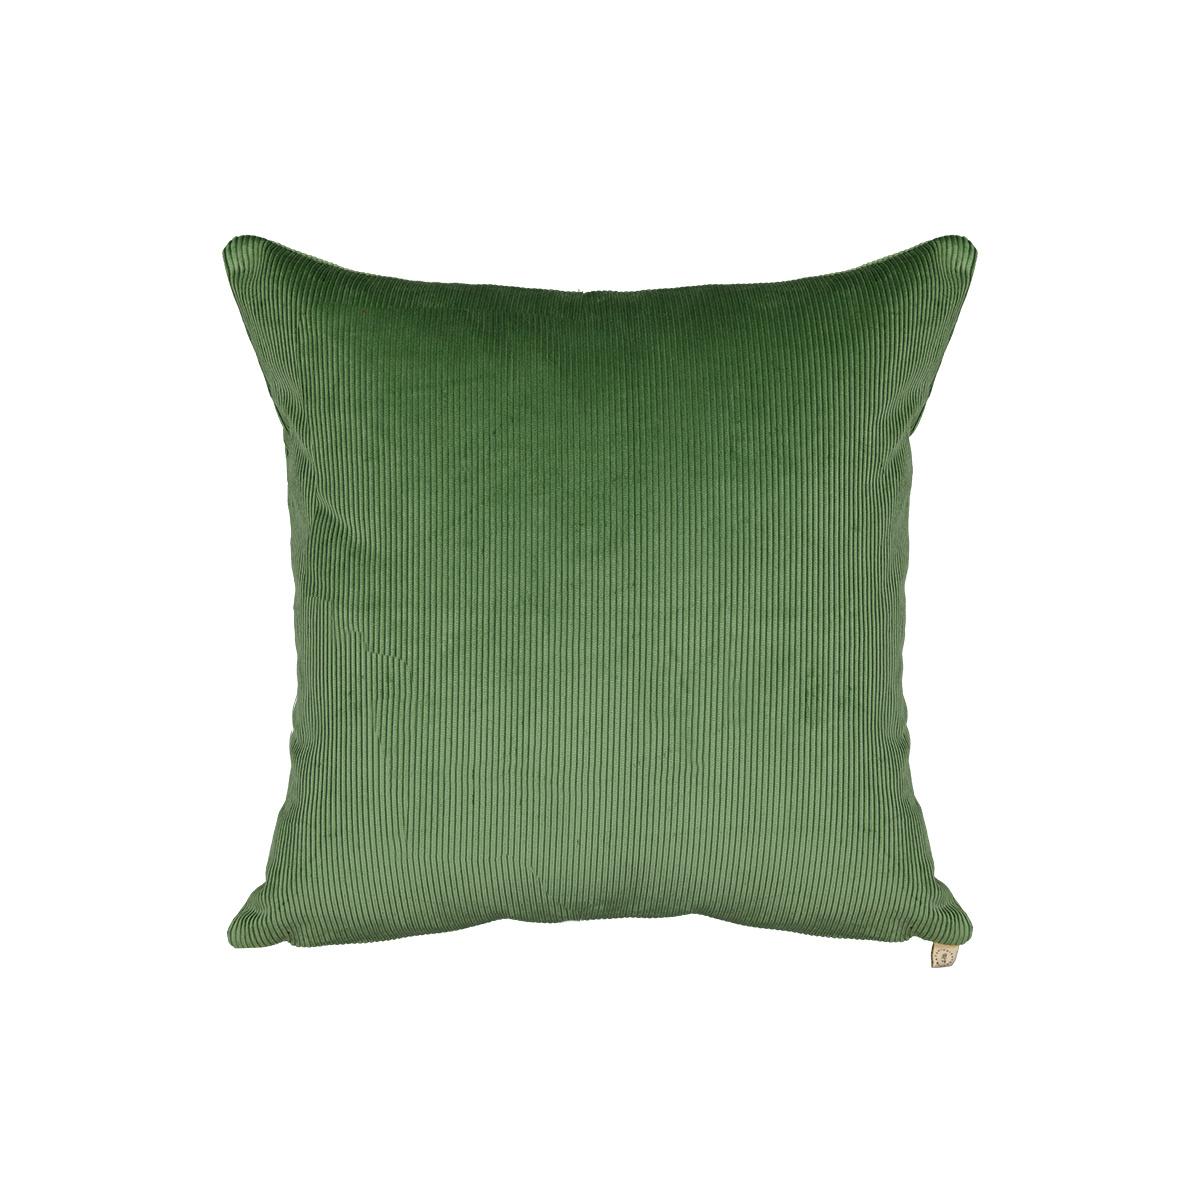 Carino almond green corduroy cushion